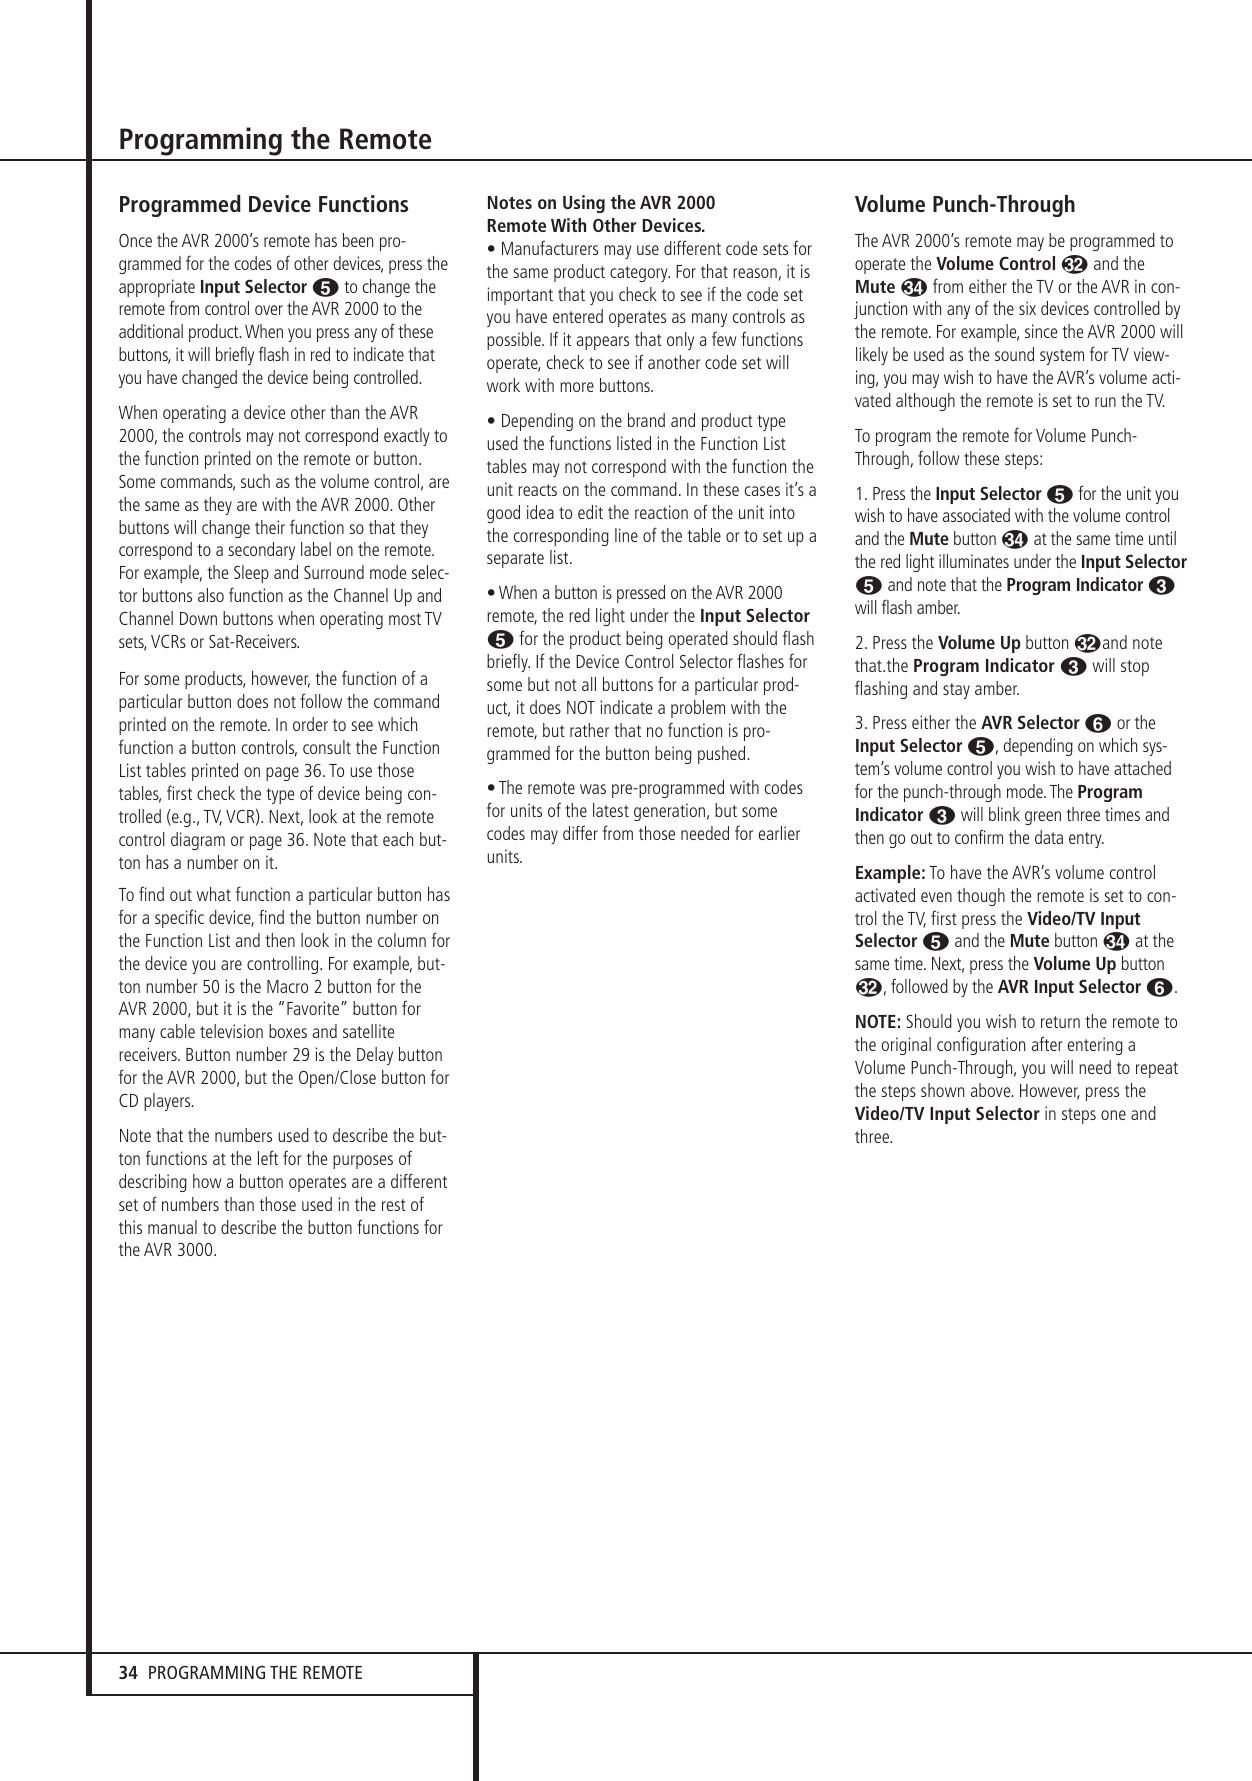 Harman Kardon Avr 2000 Users Manual